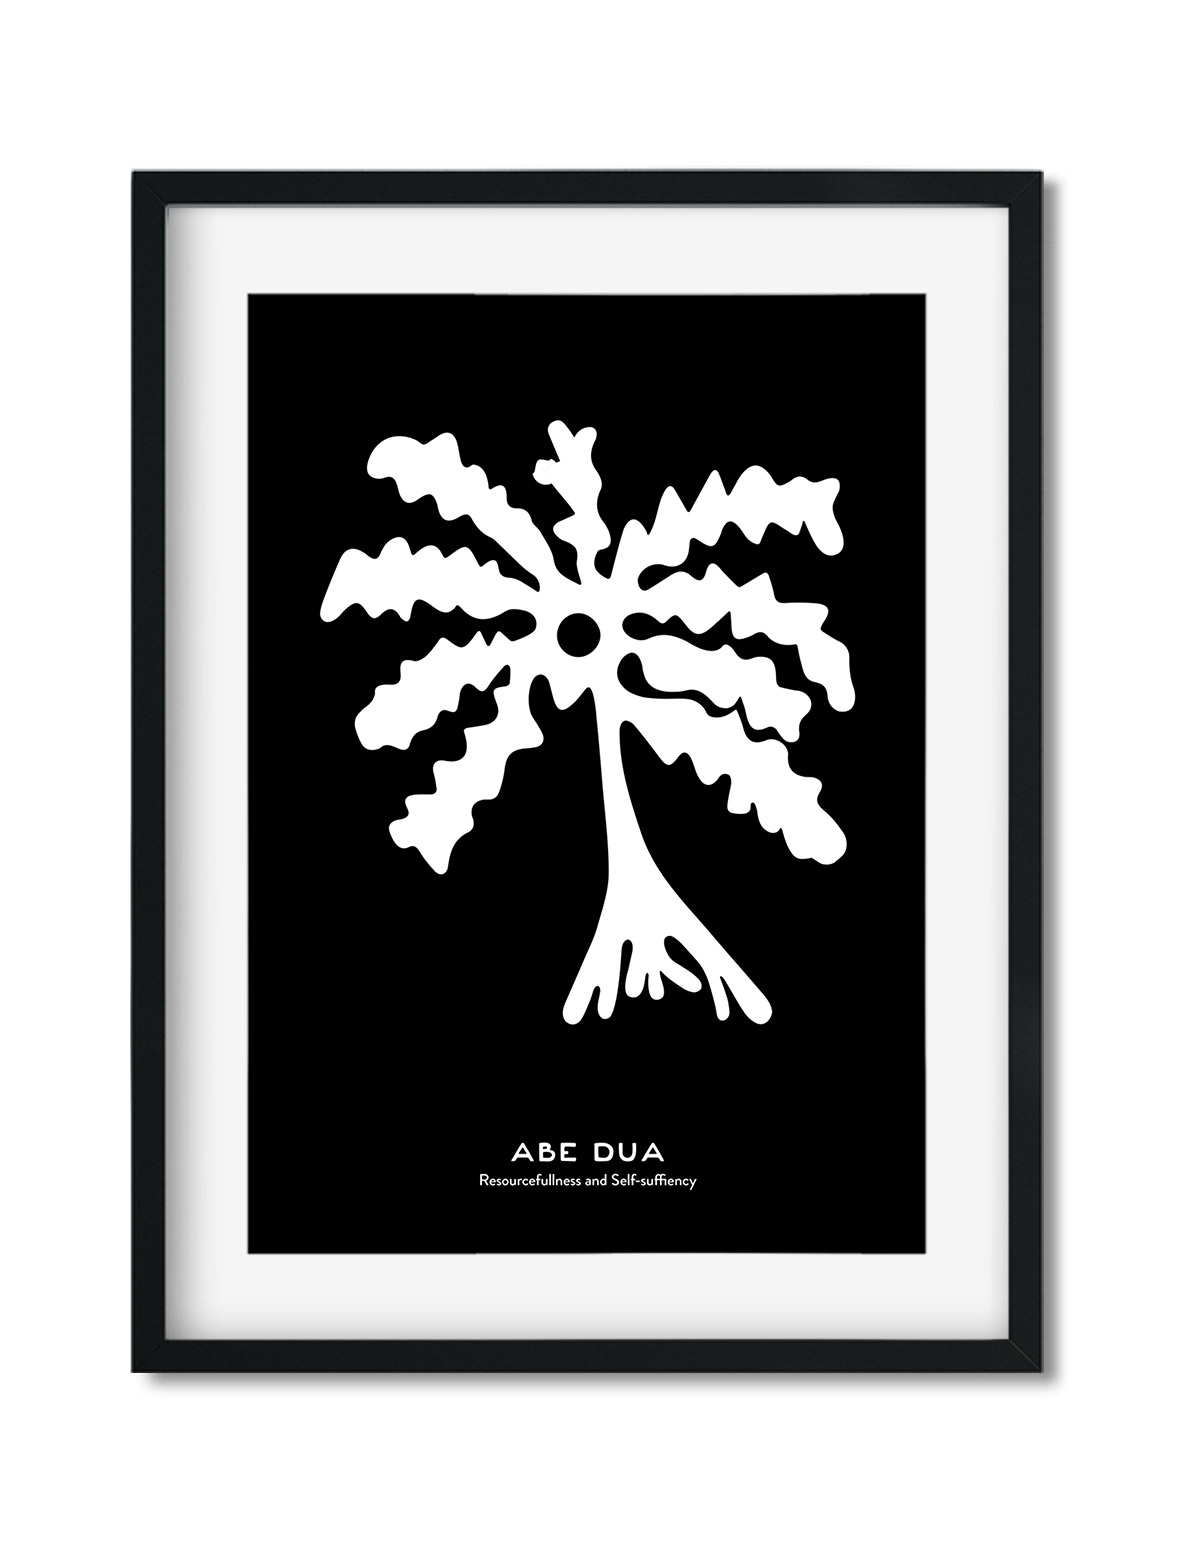 Abe-Dua, The Adinkra Symbol, African Art Print Black